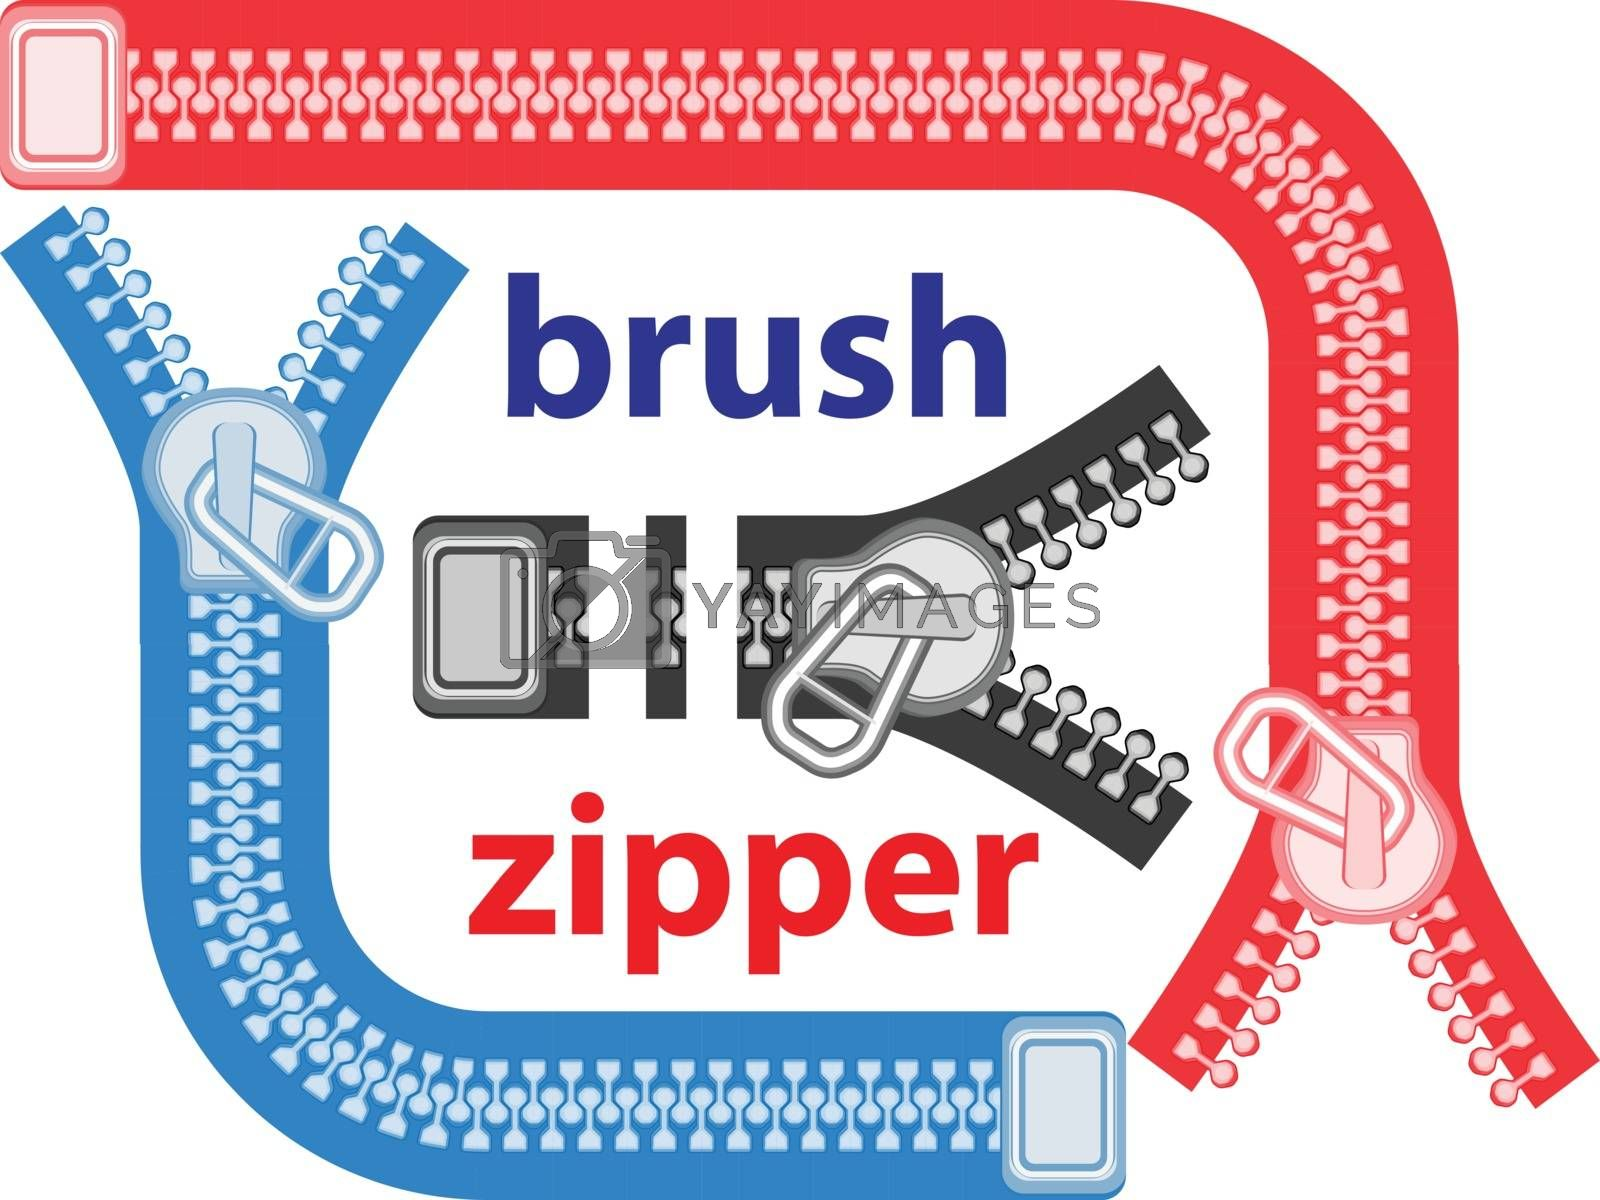 seamless a vector brush - a fastener zipper